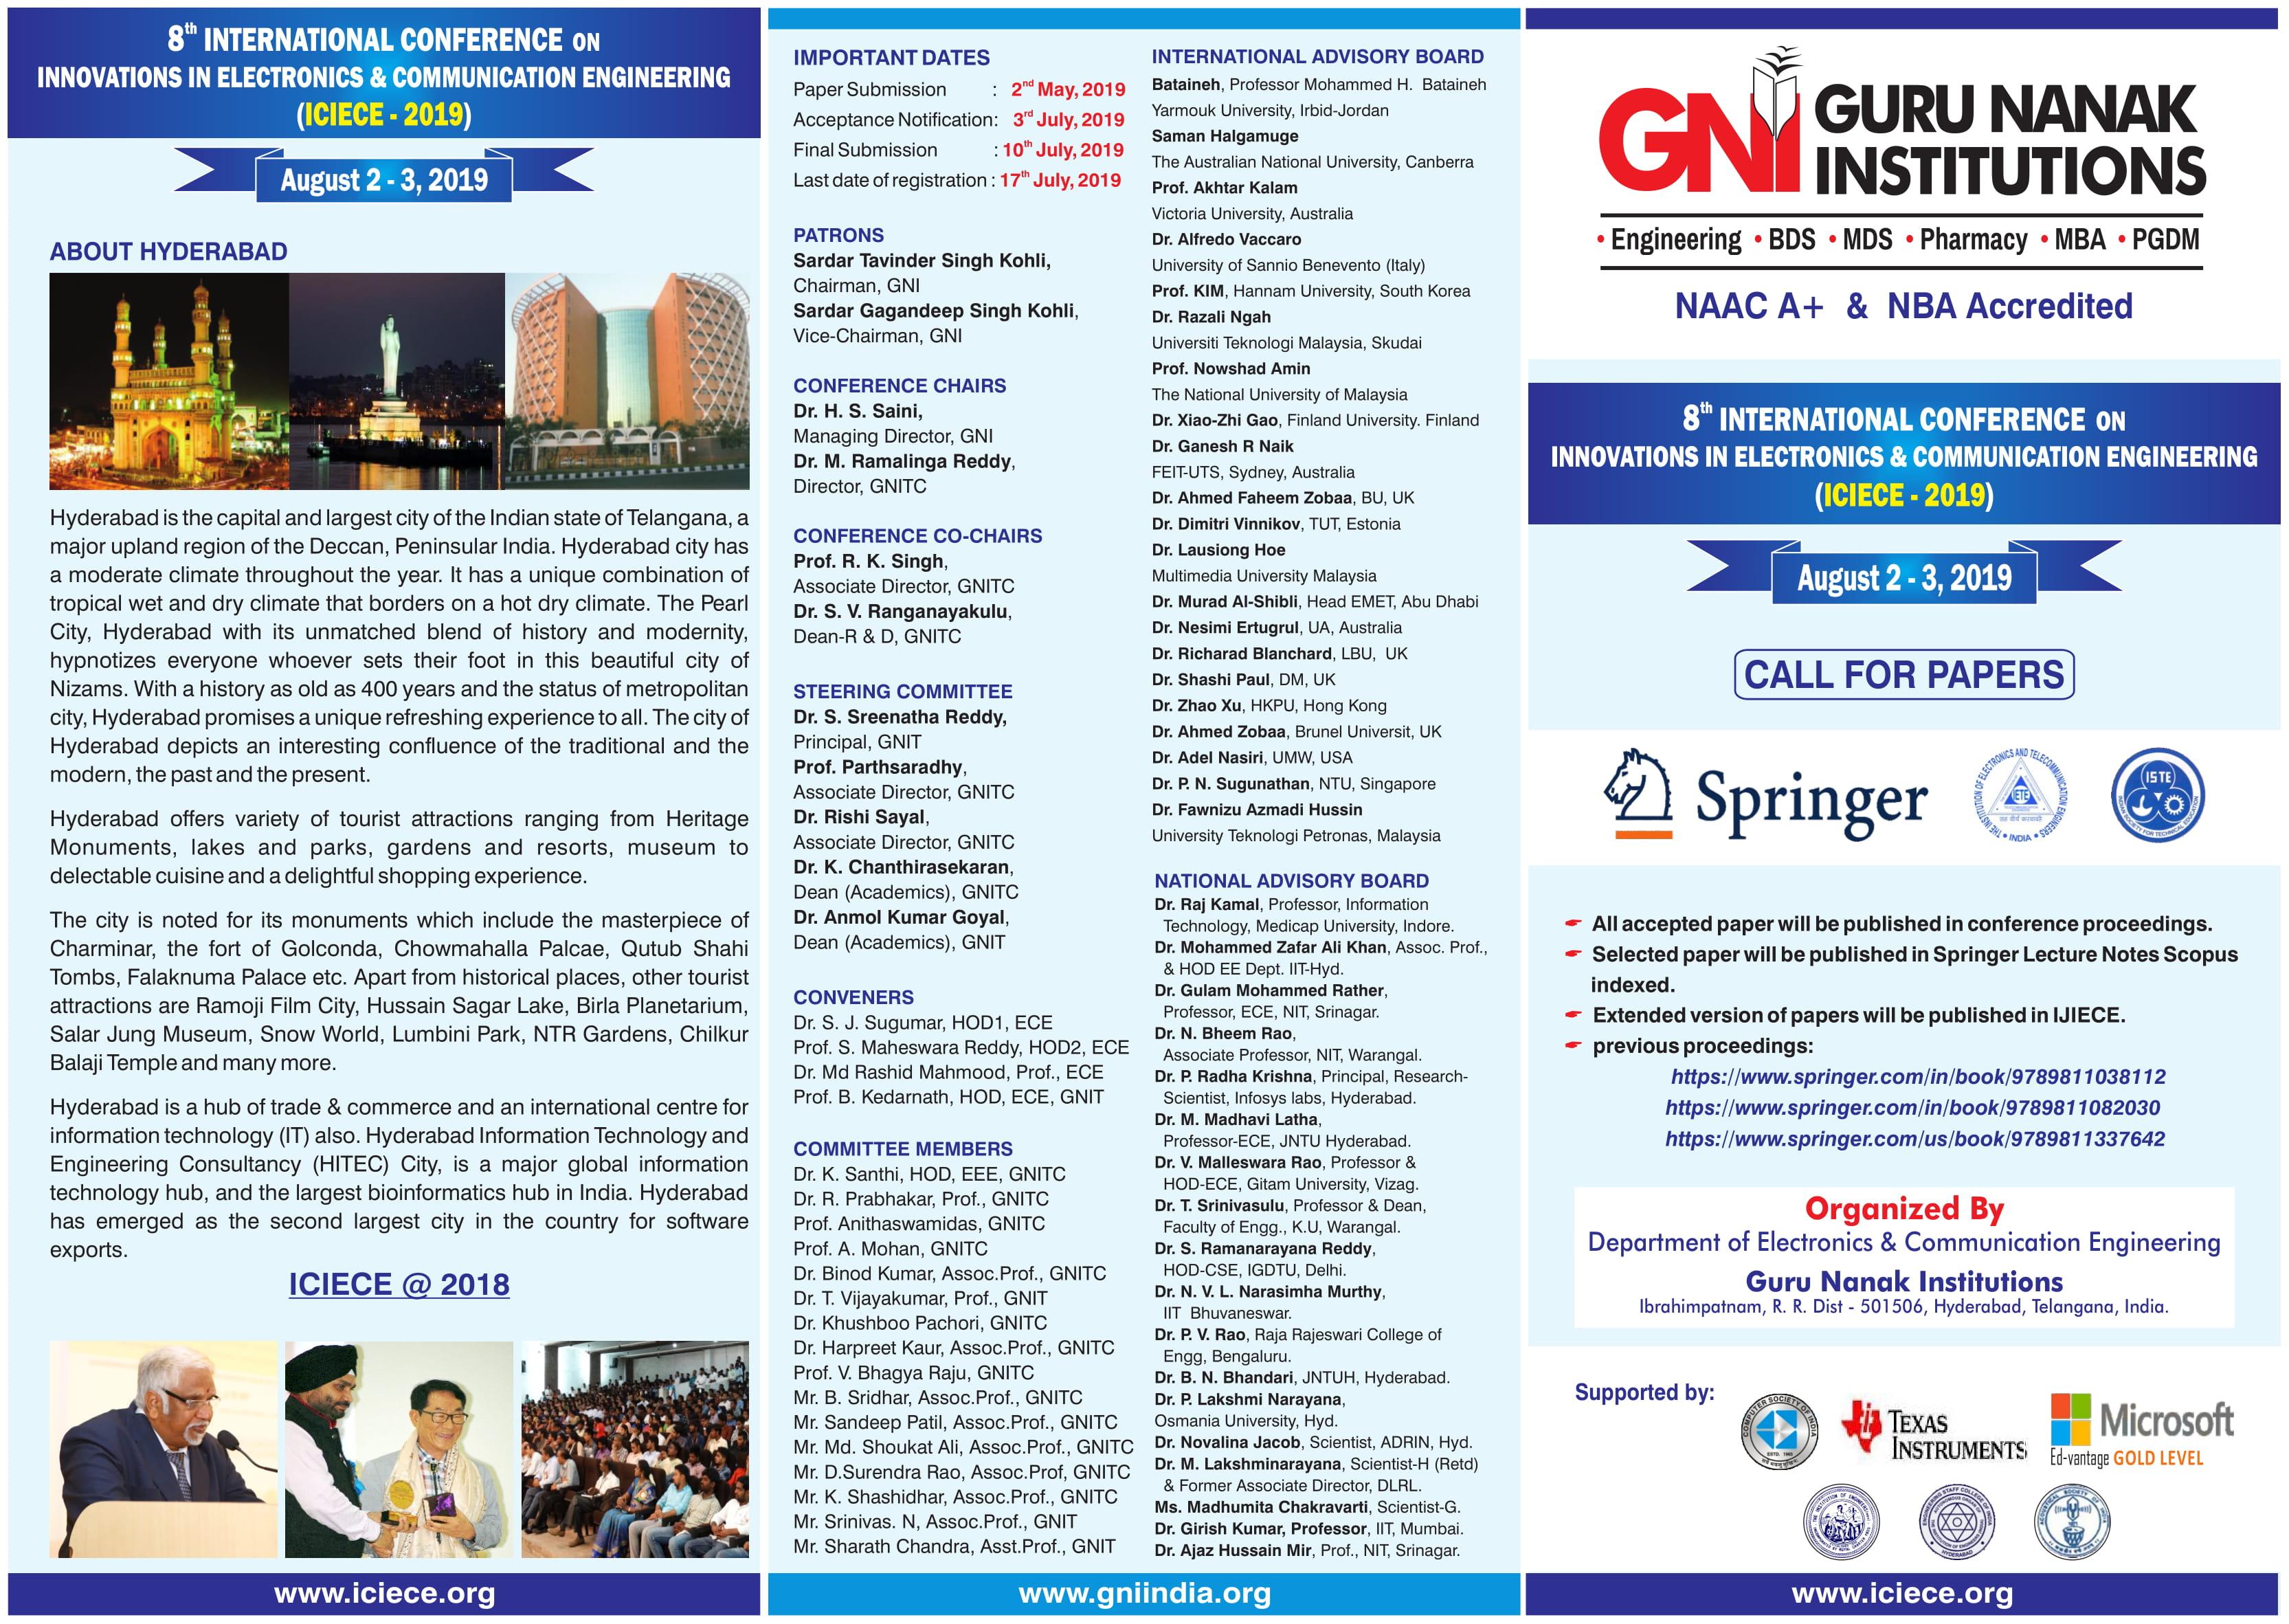 INTERNATIONAL CONFERENCE ON INNOVATIONS IN ELECTRONICS & COMMUNICATION ENGINEERING (ICIECE - 2019), Hyderabad, Telangana, India